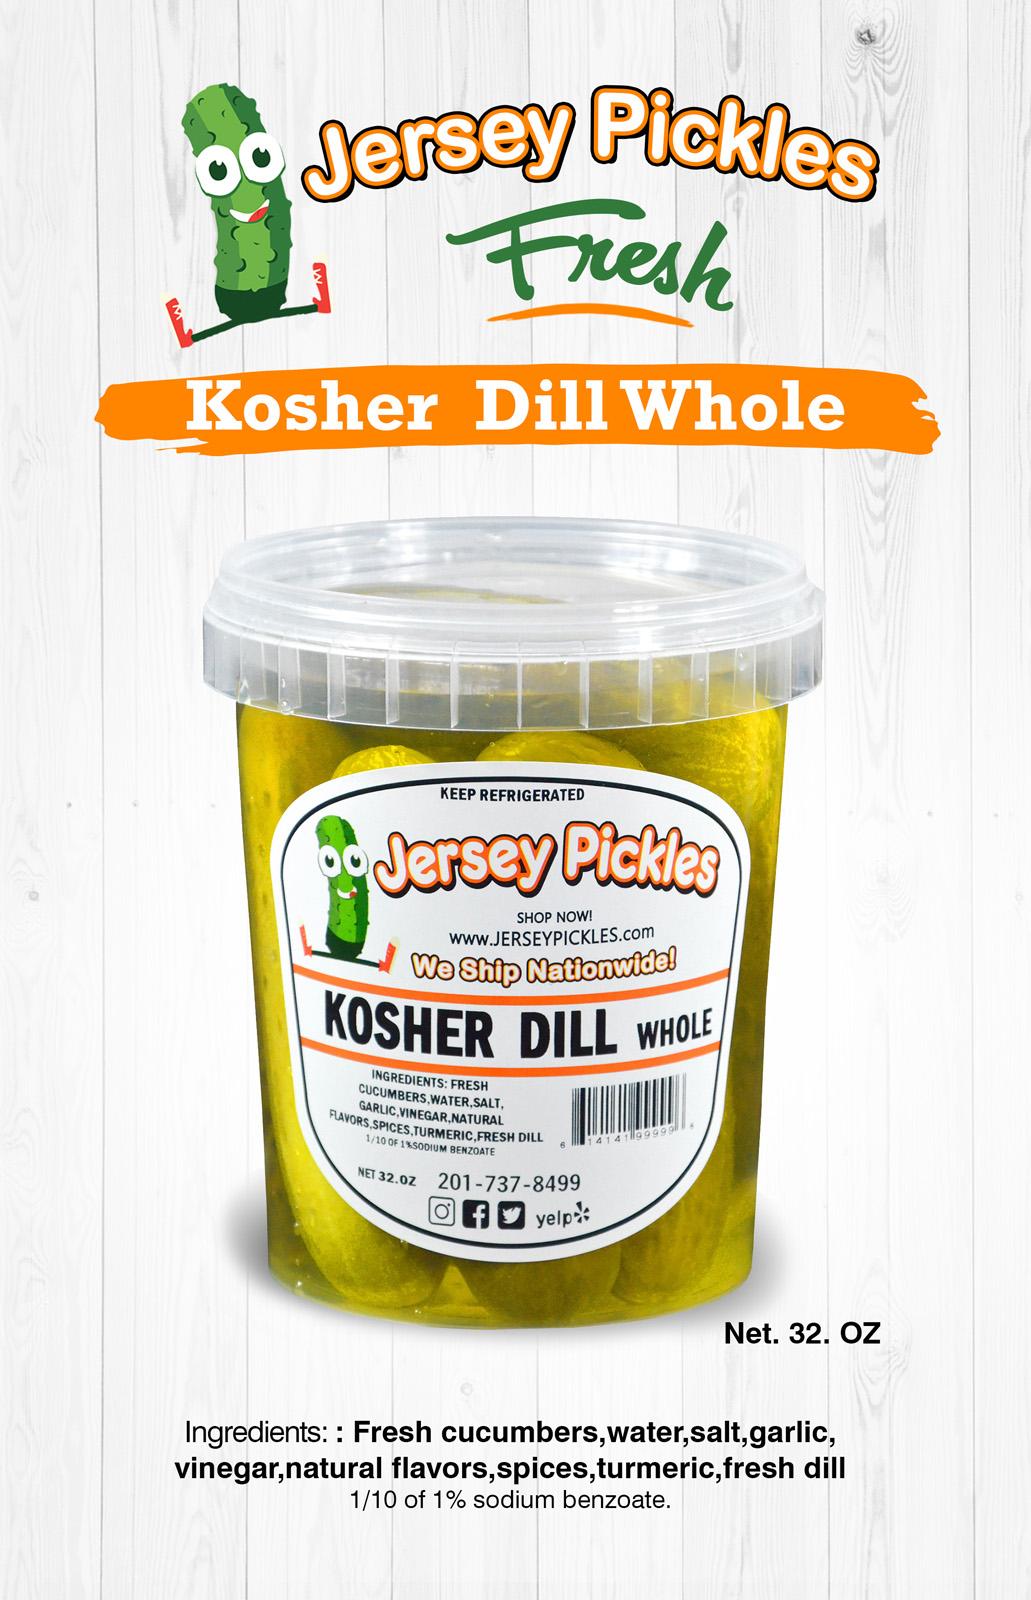 Kosher Dill Whole